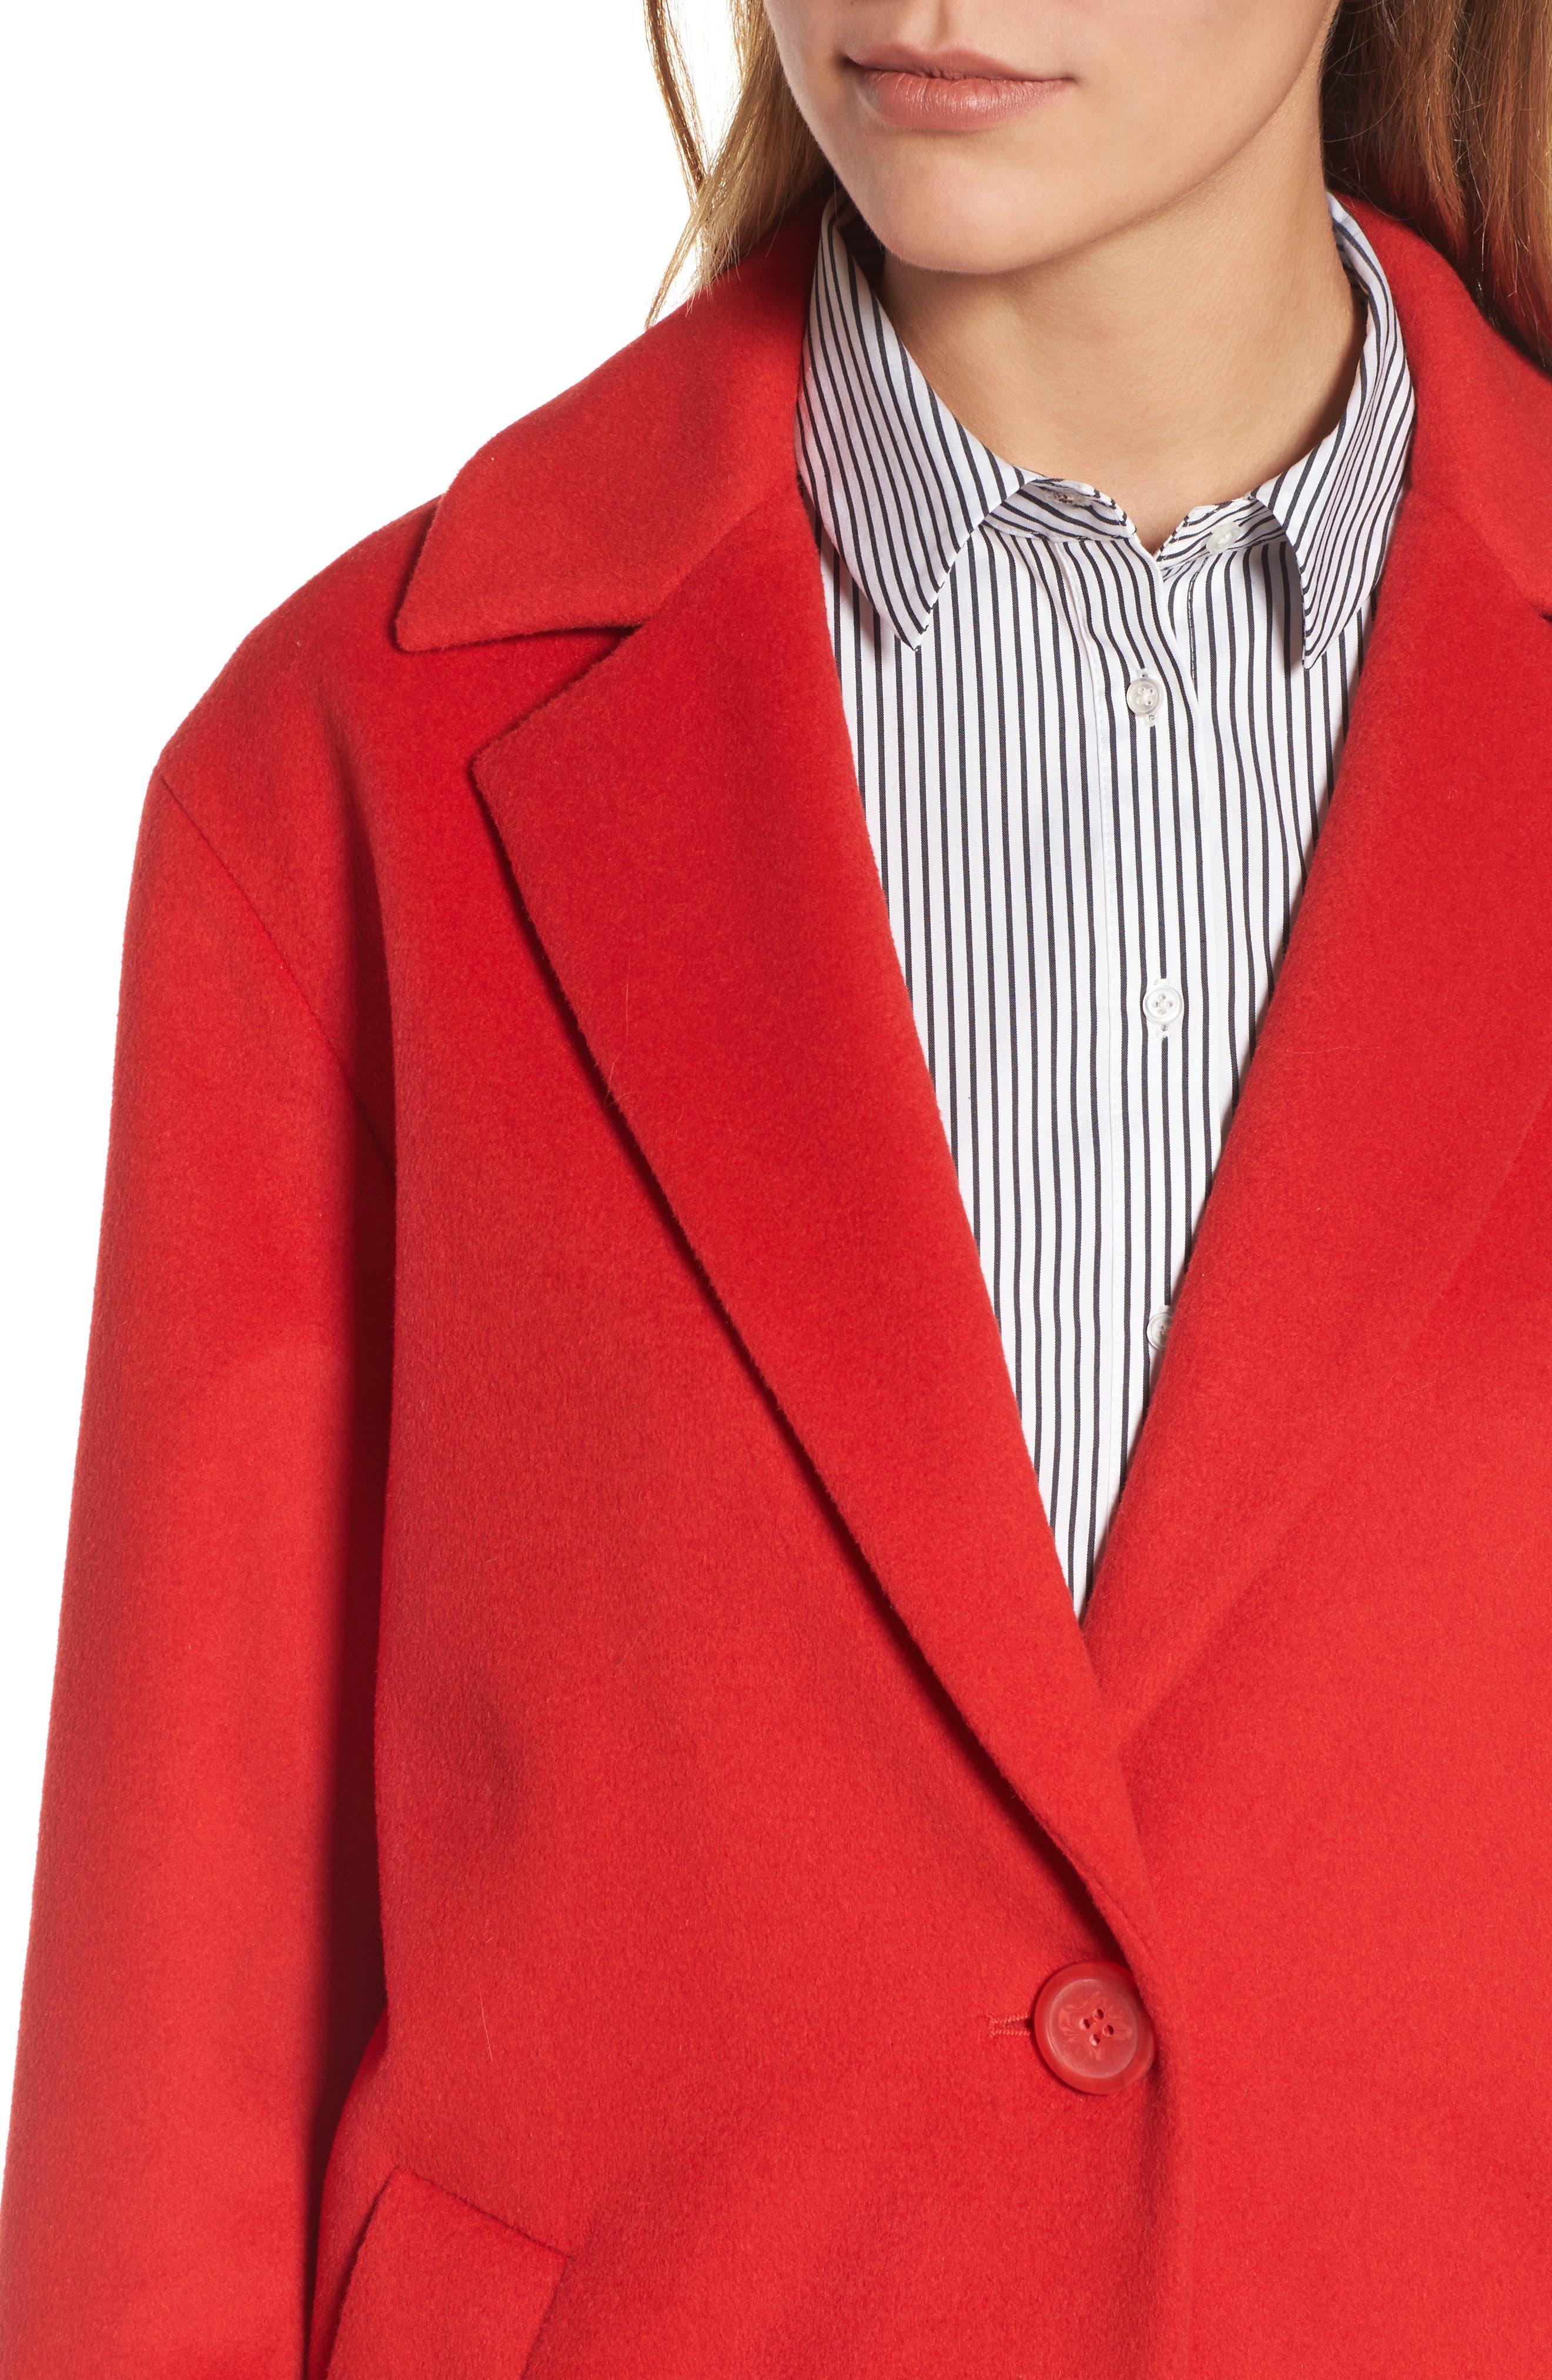 Wool Blend Coat,                             Alternate thumbnail 20, color,